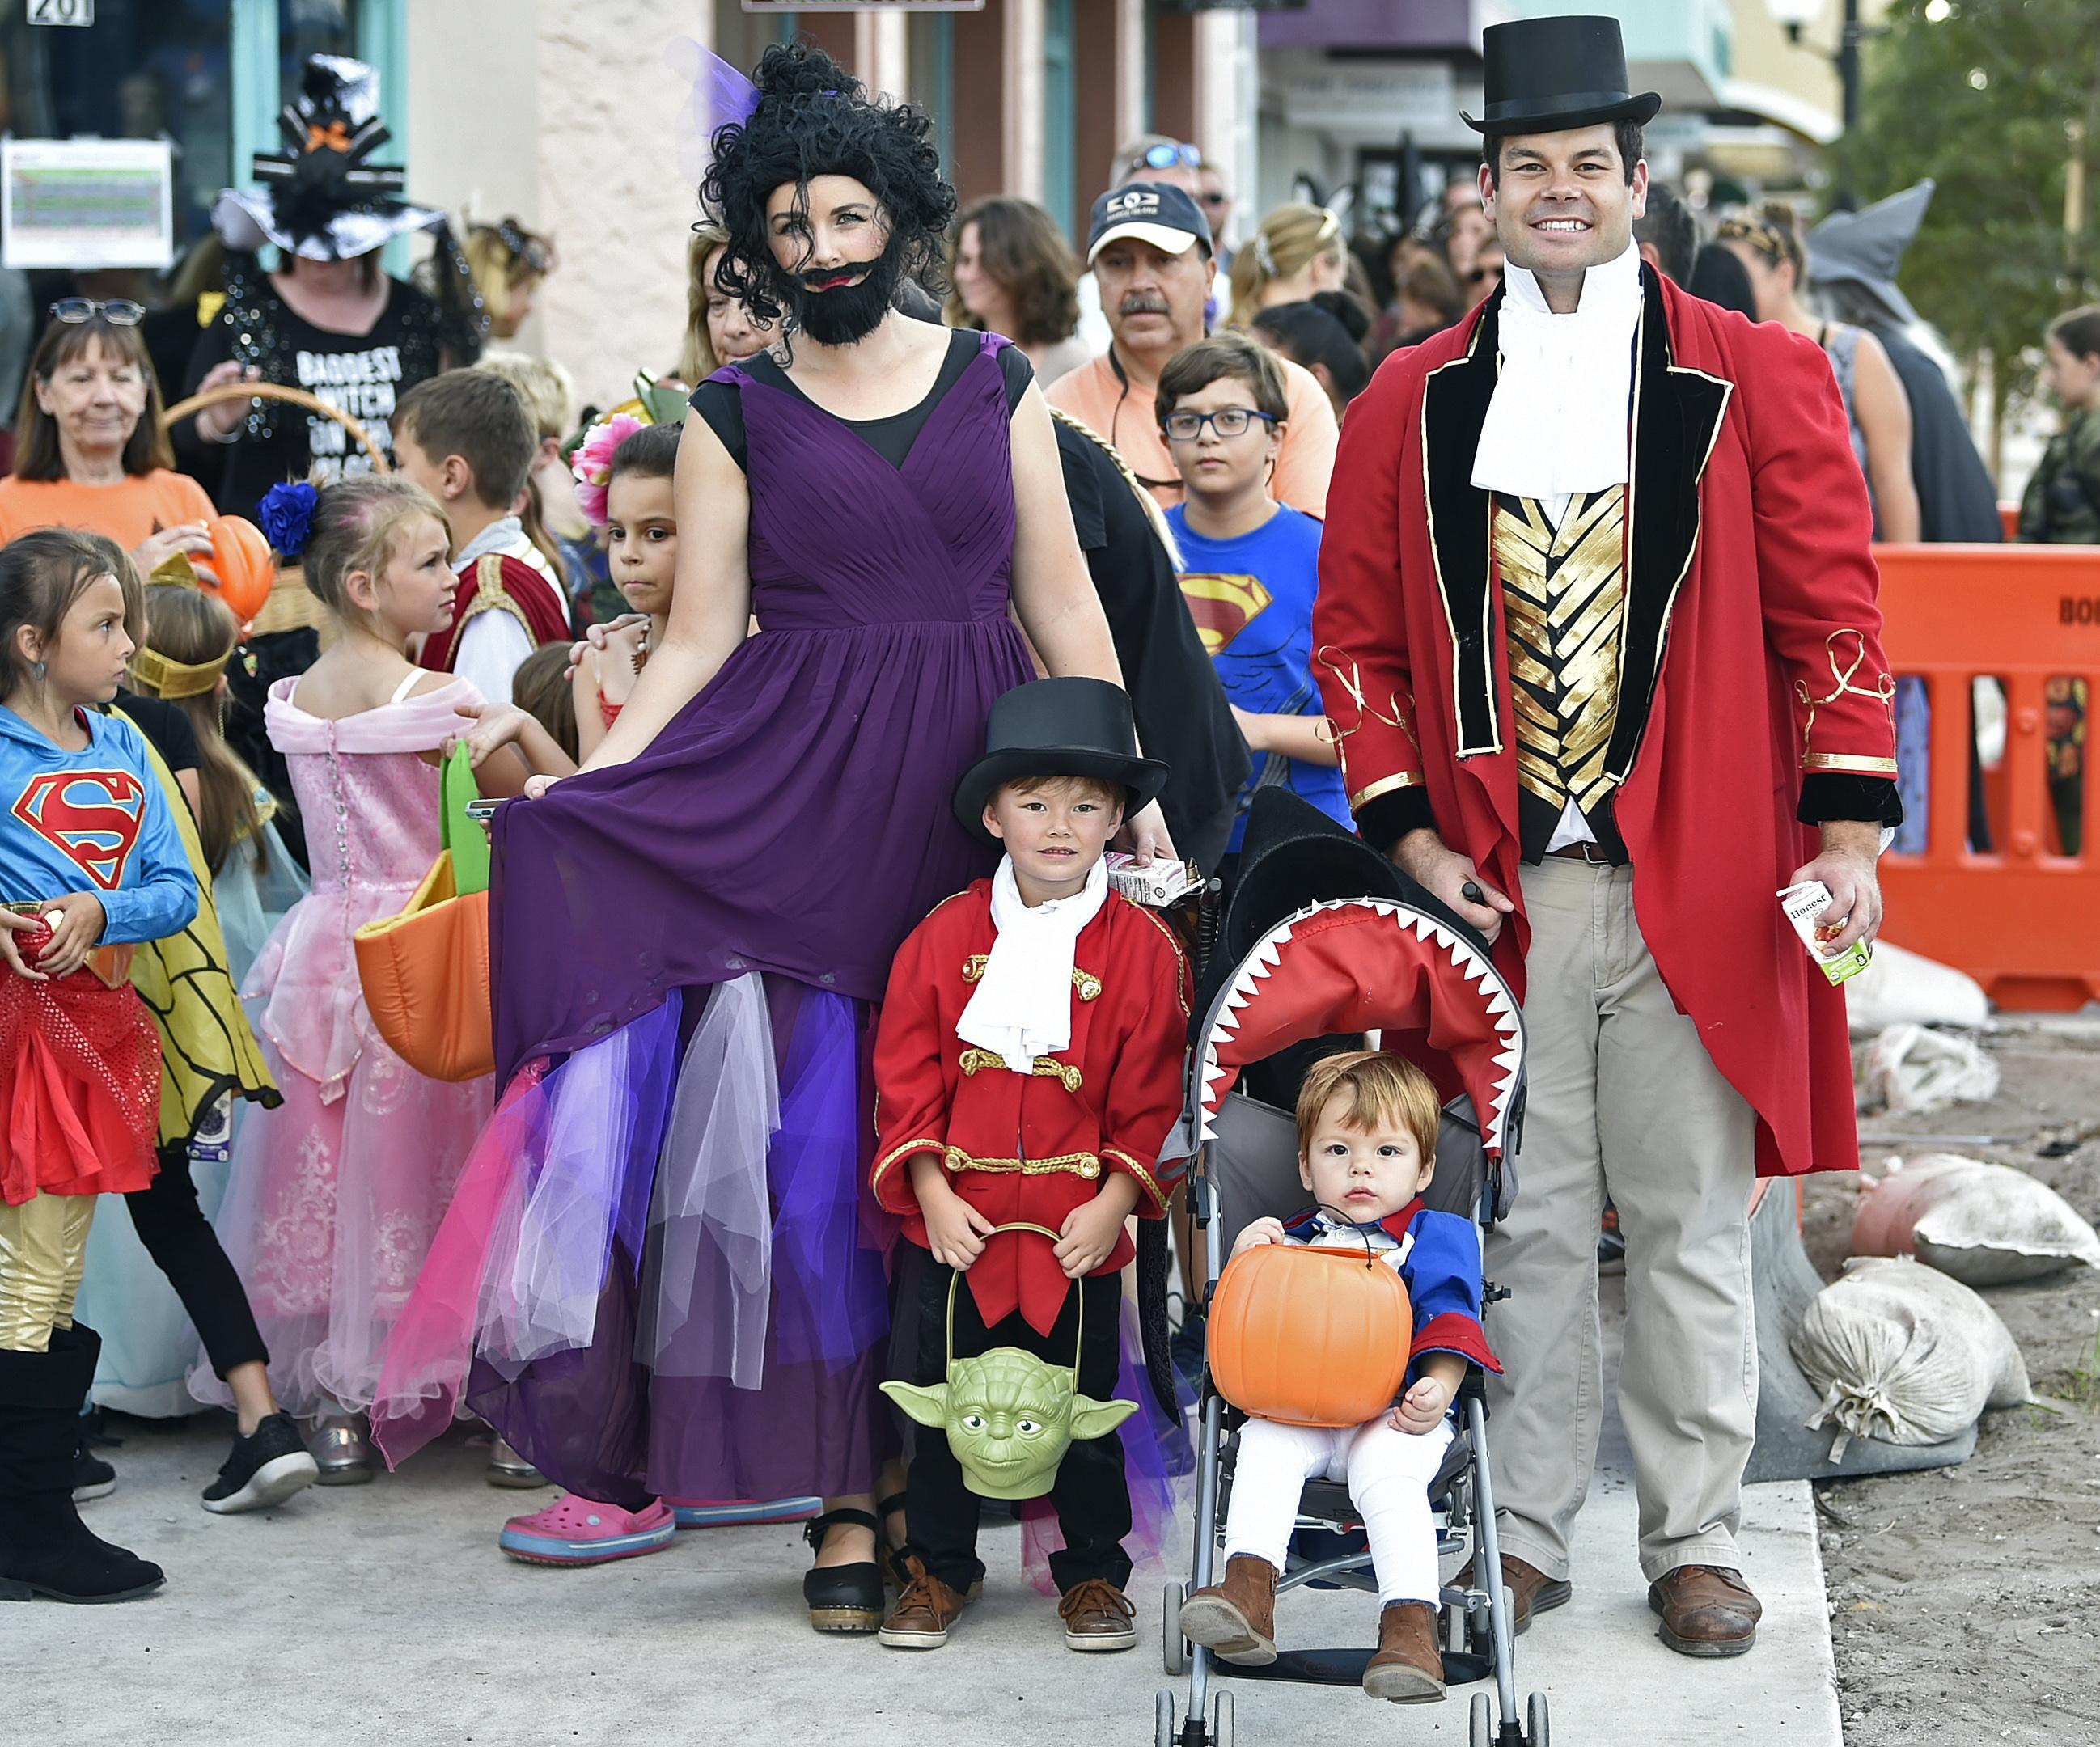 Halloween Custome Party Near Punta Gorda Fl 2020 31 Best Halloween Events in the Sarasota Area 2019